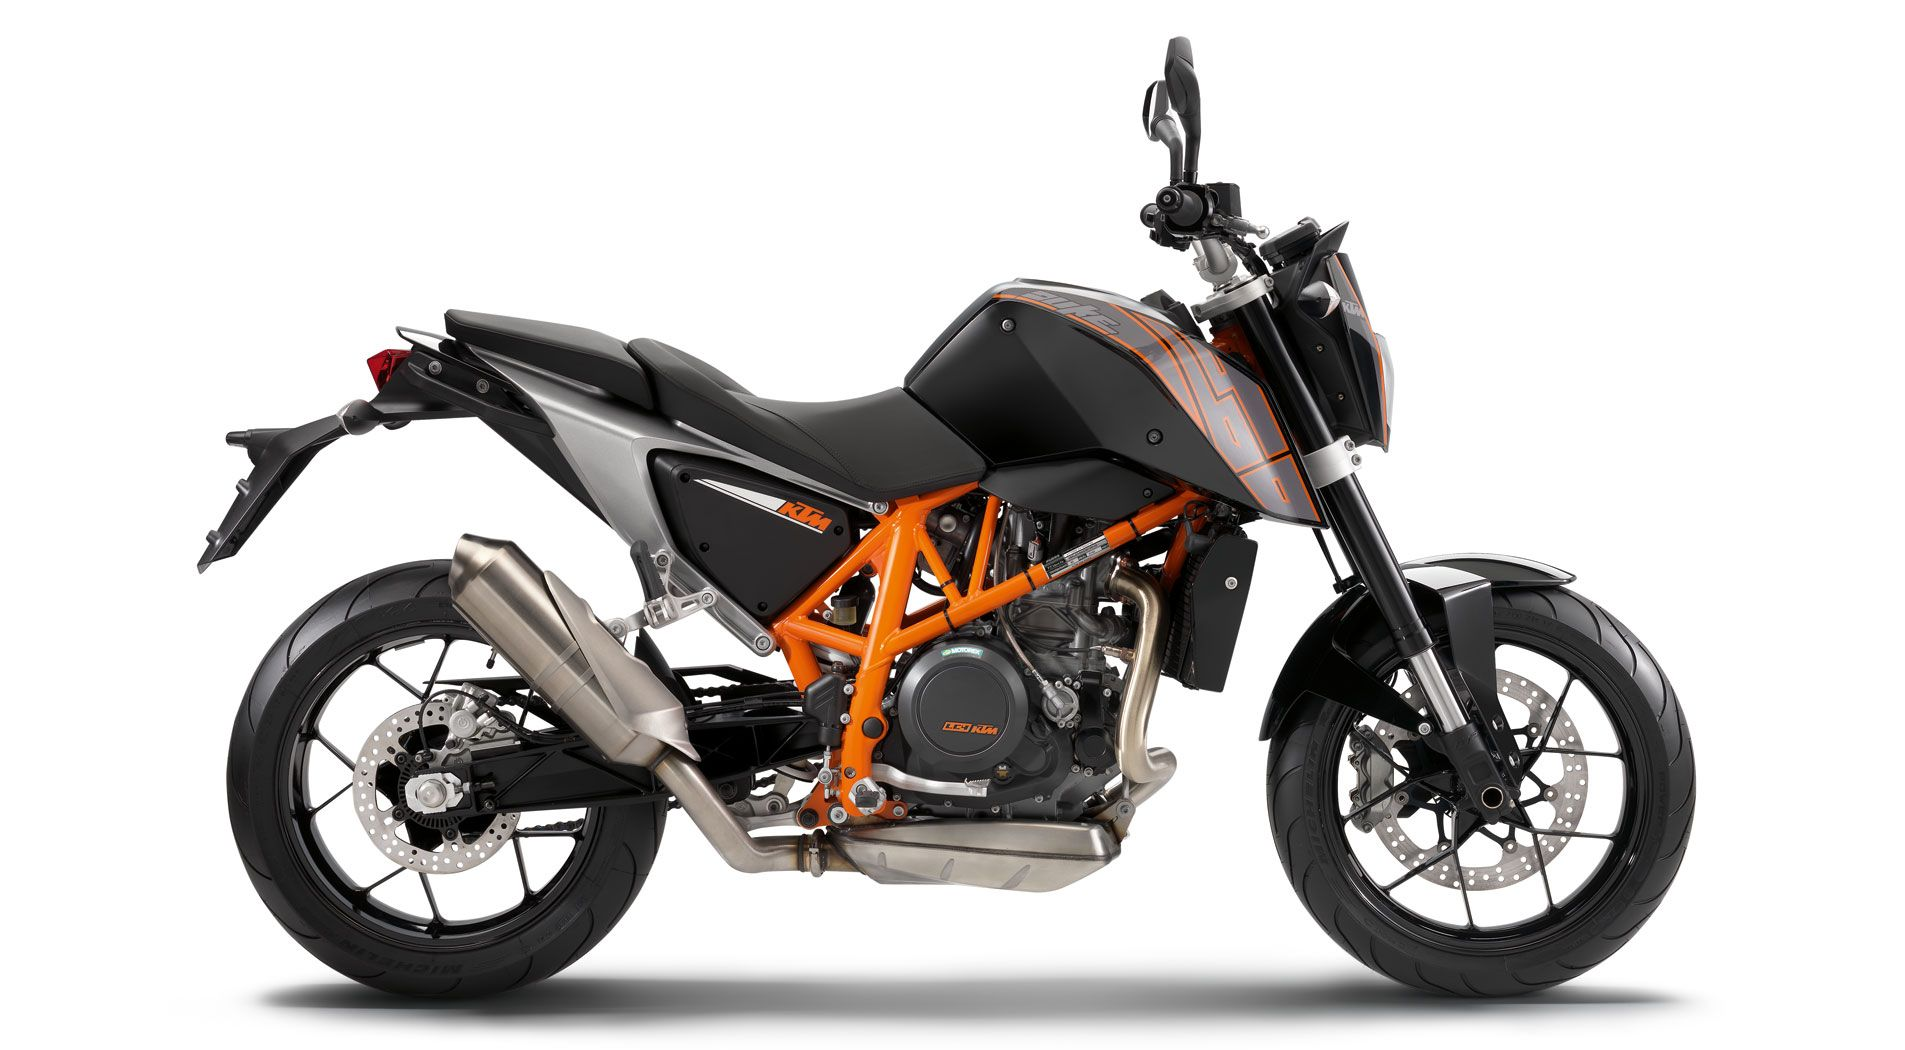 2014 KTM 690 Duke The essence of motorcycling Ktm 690